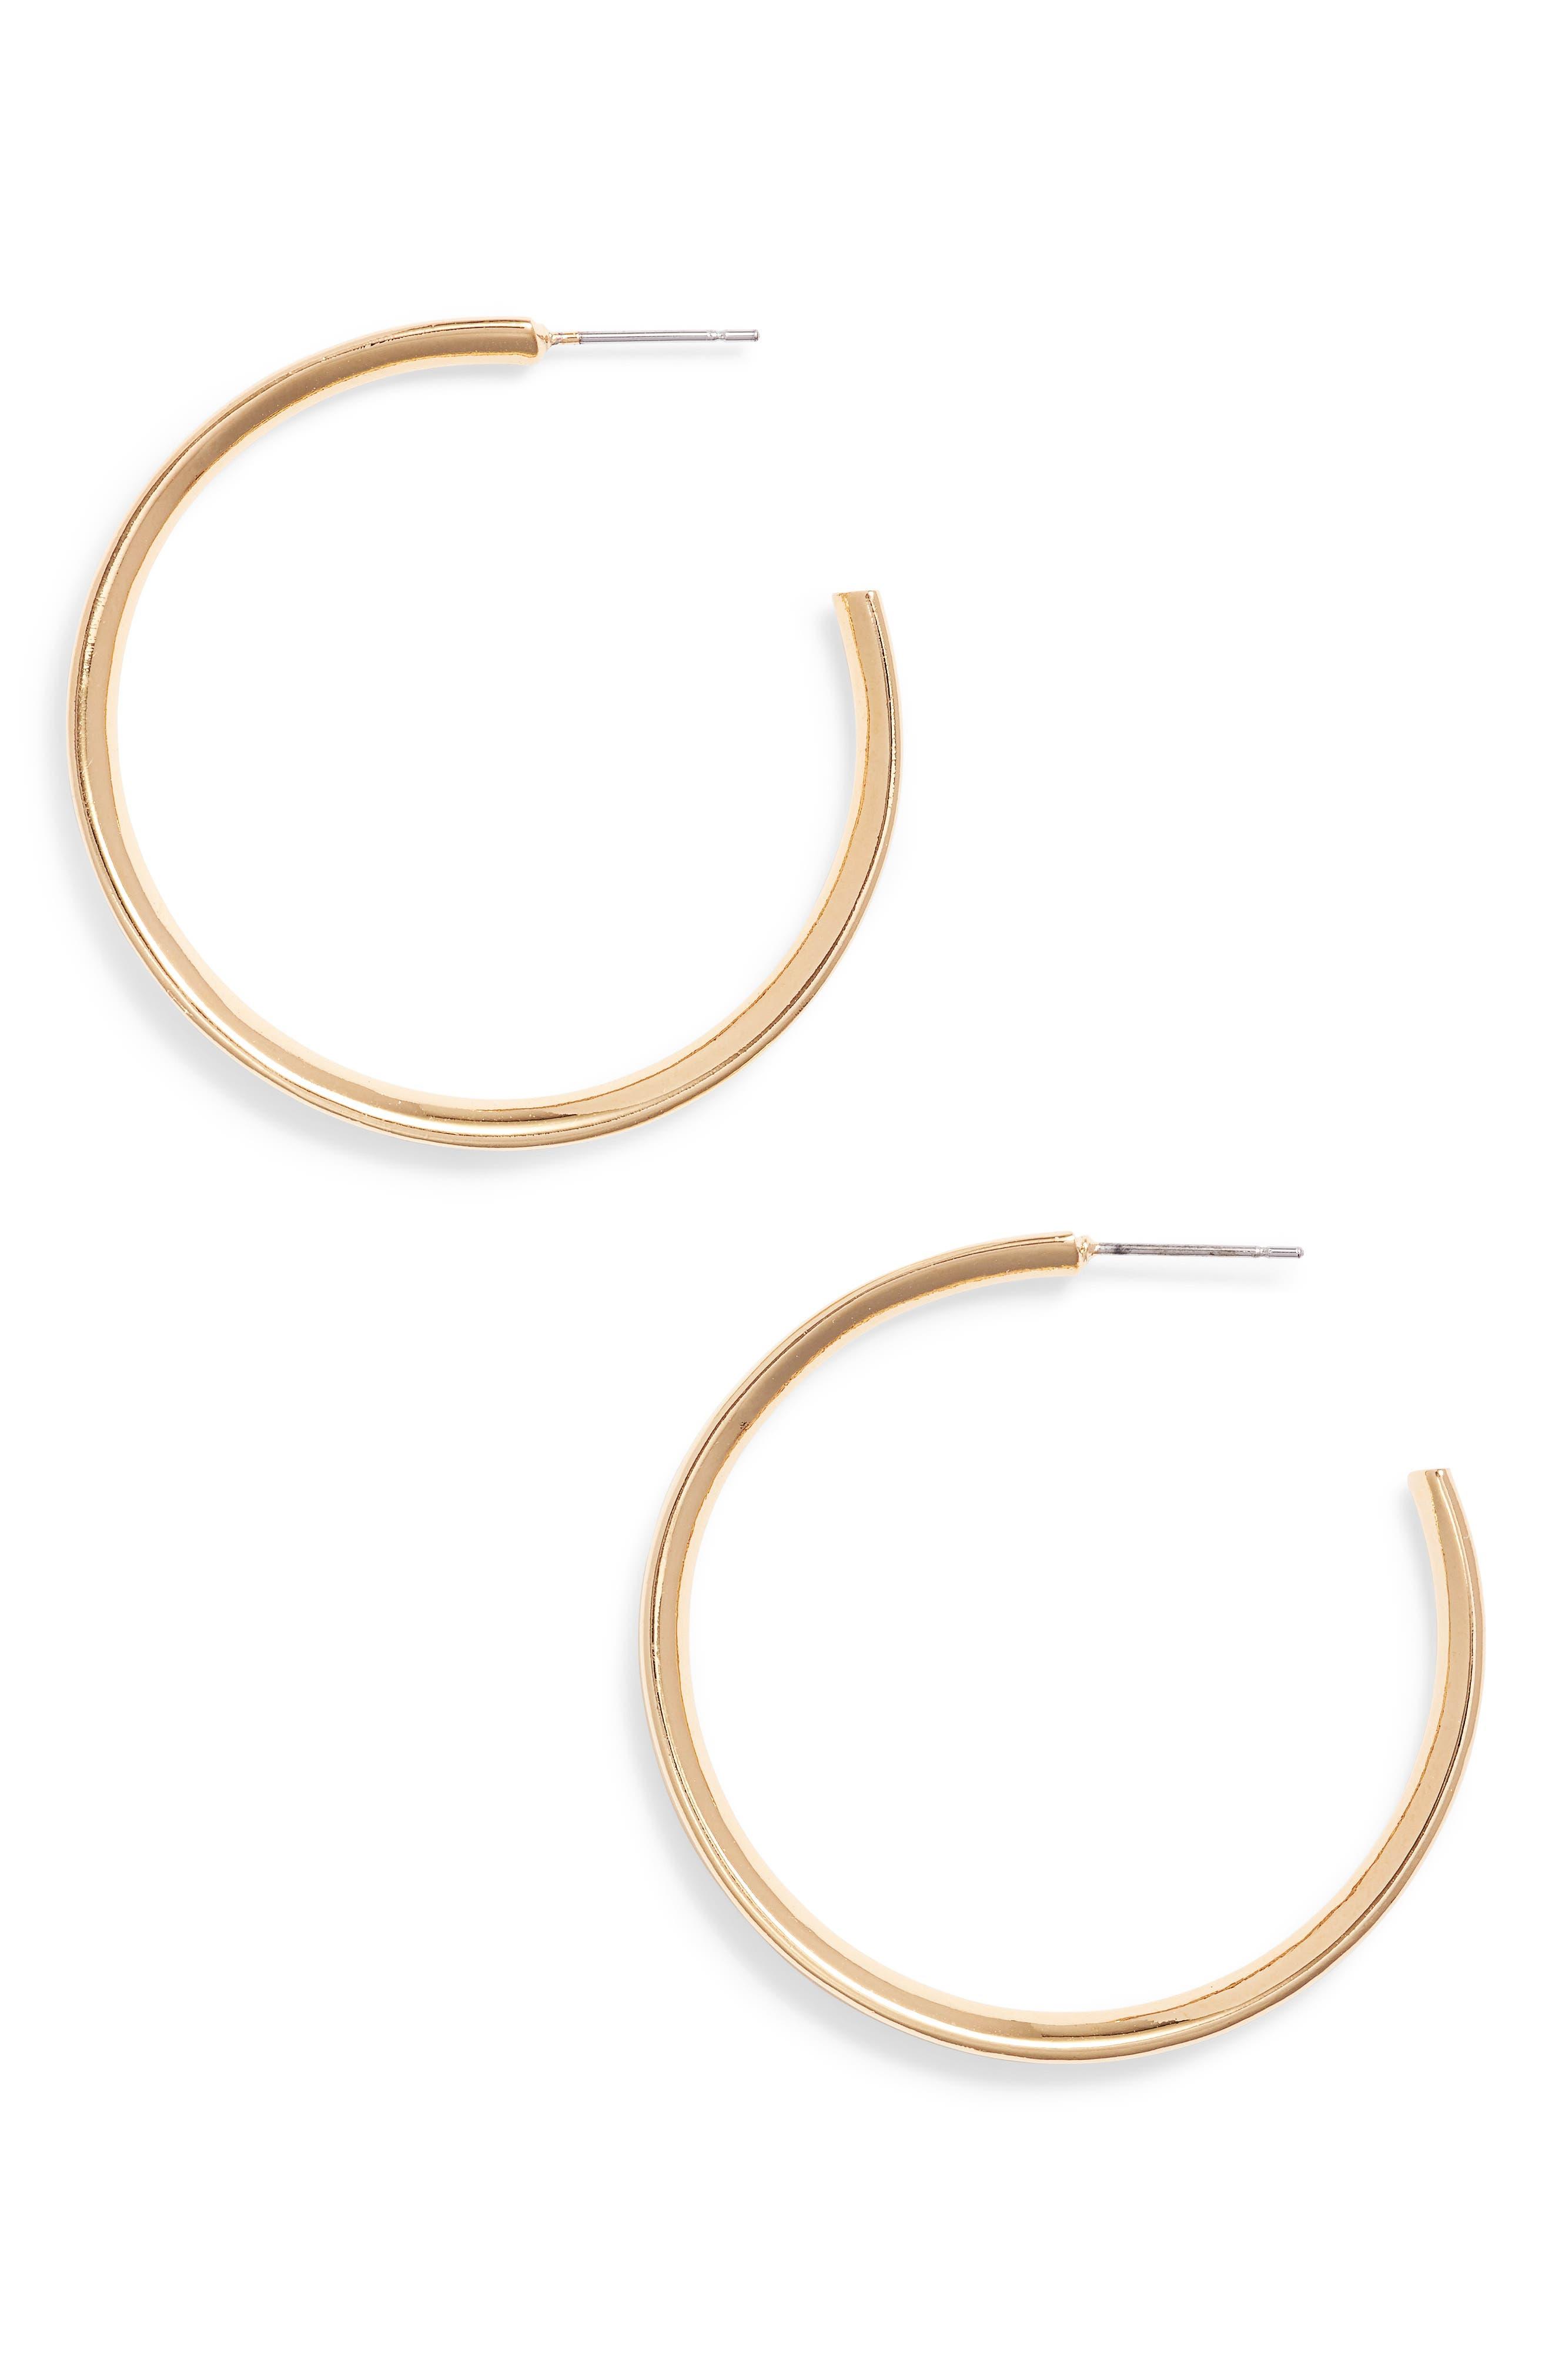 Heart Shaped Hoop Earrings,                         Main,                         color, Gold